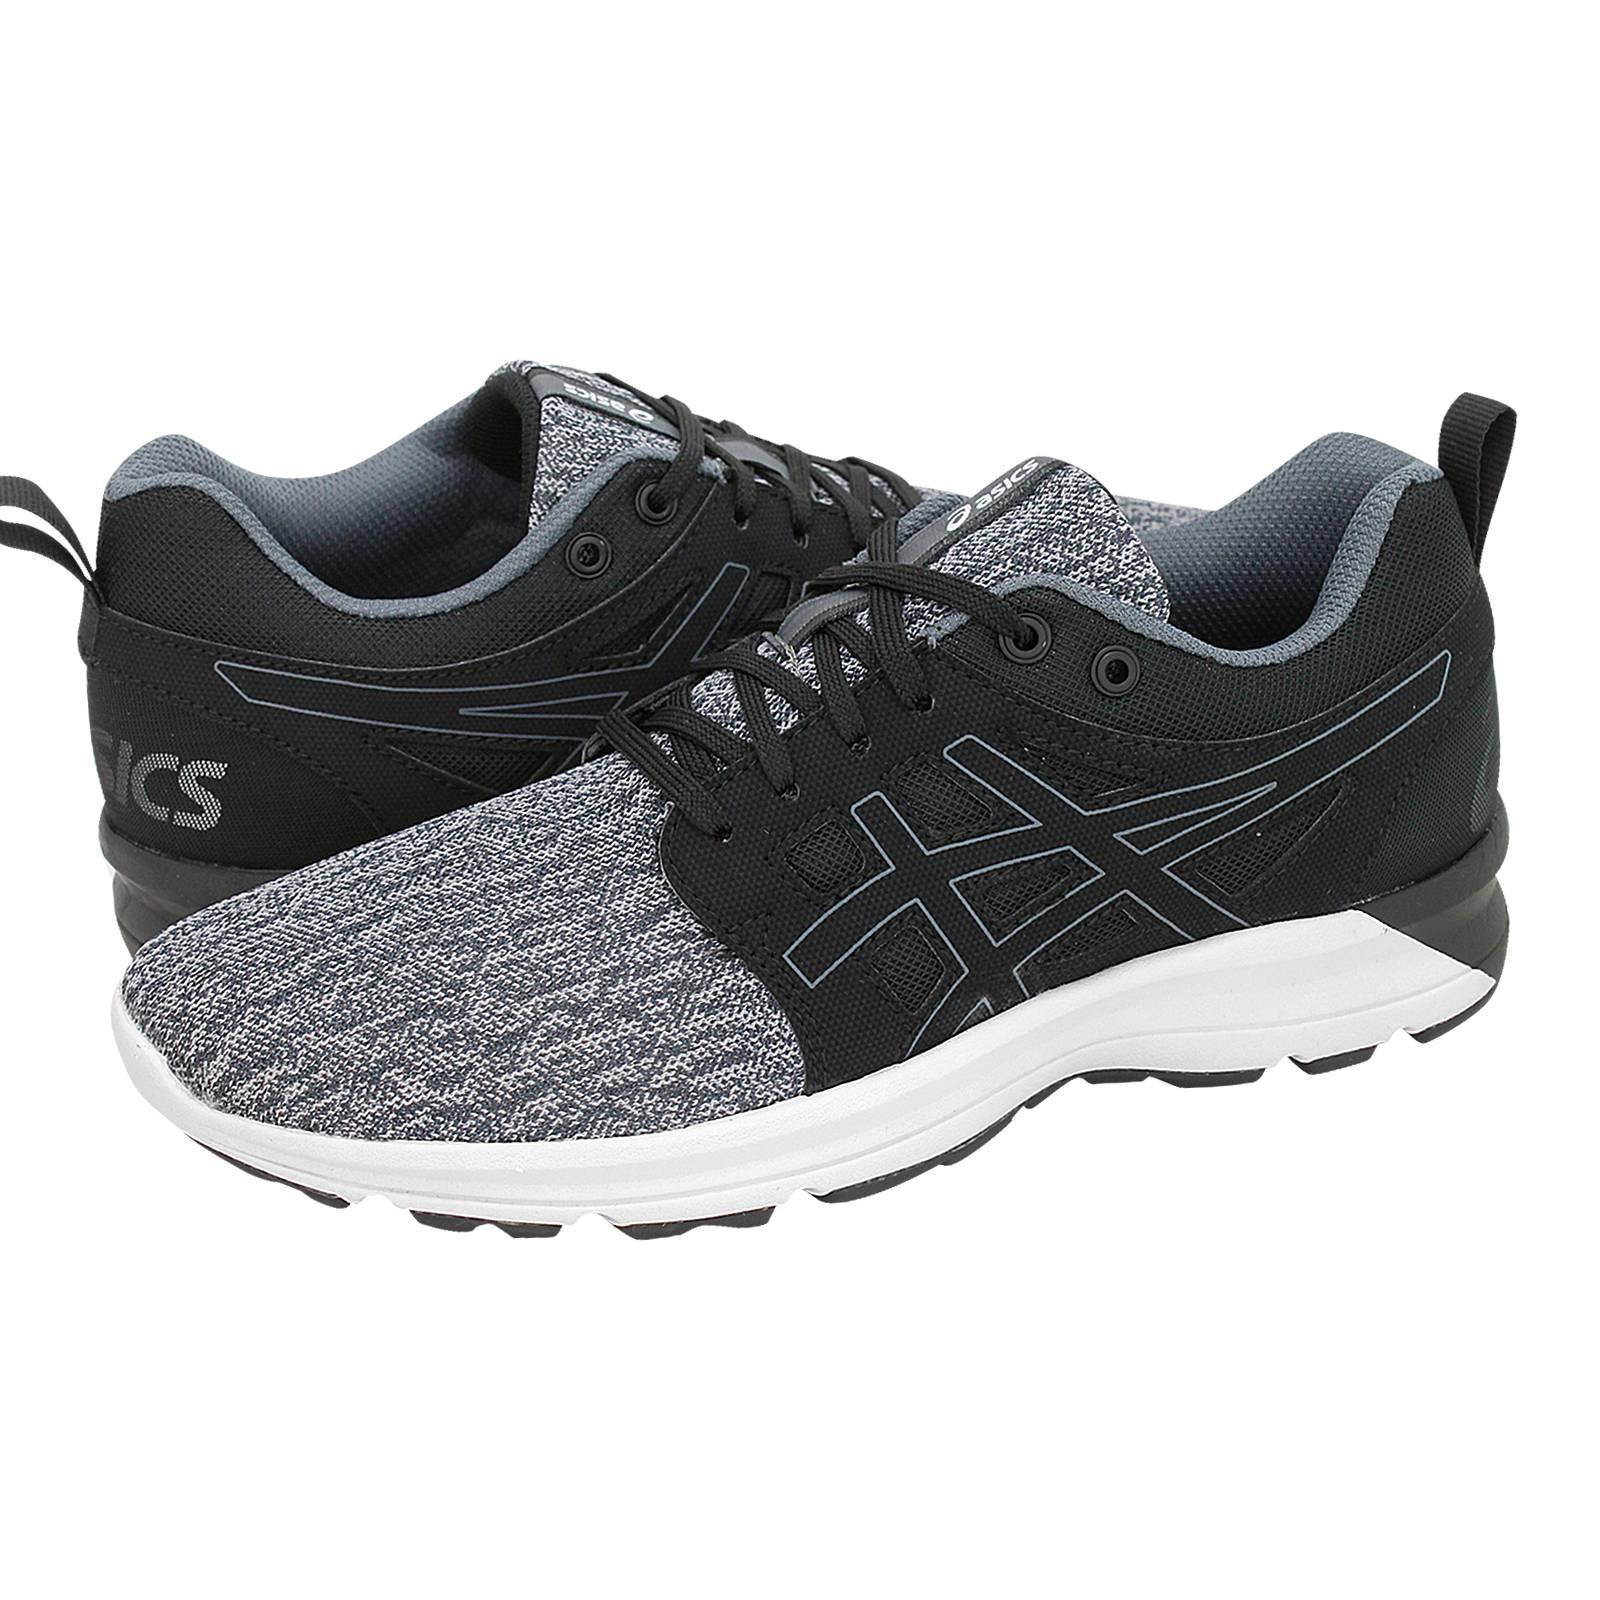 fb449b6d1e5 Gel-Torrance - Γυναικεία αθλητικά παπούτσια Asics από υφασμα και ...